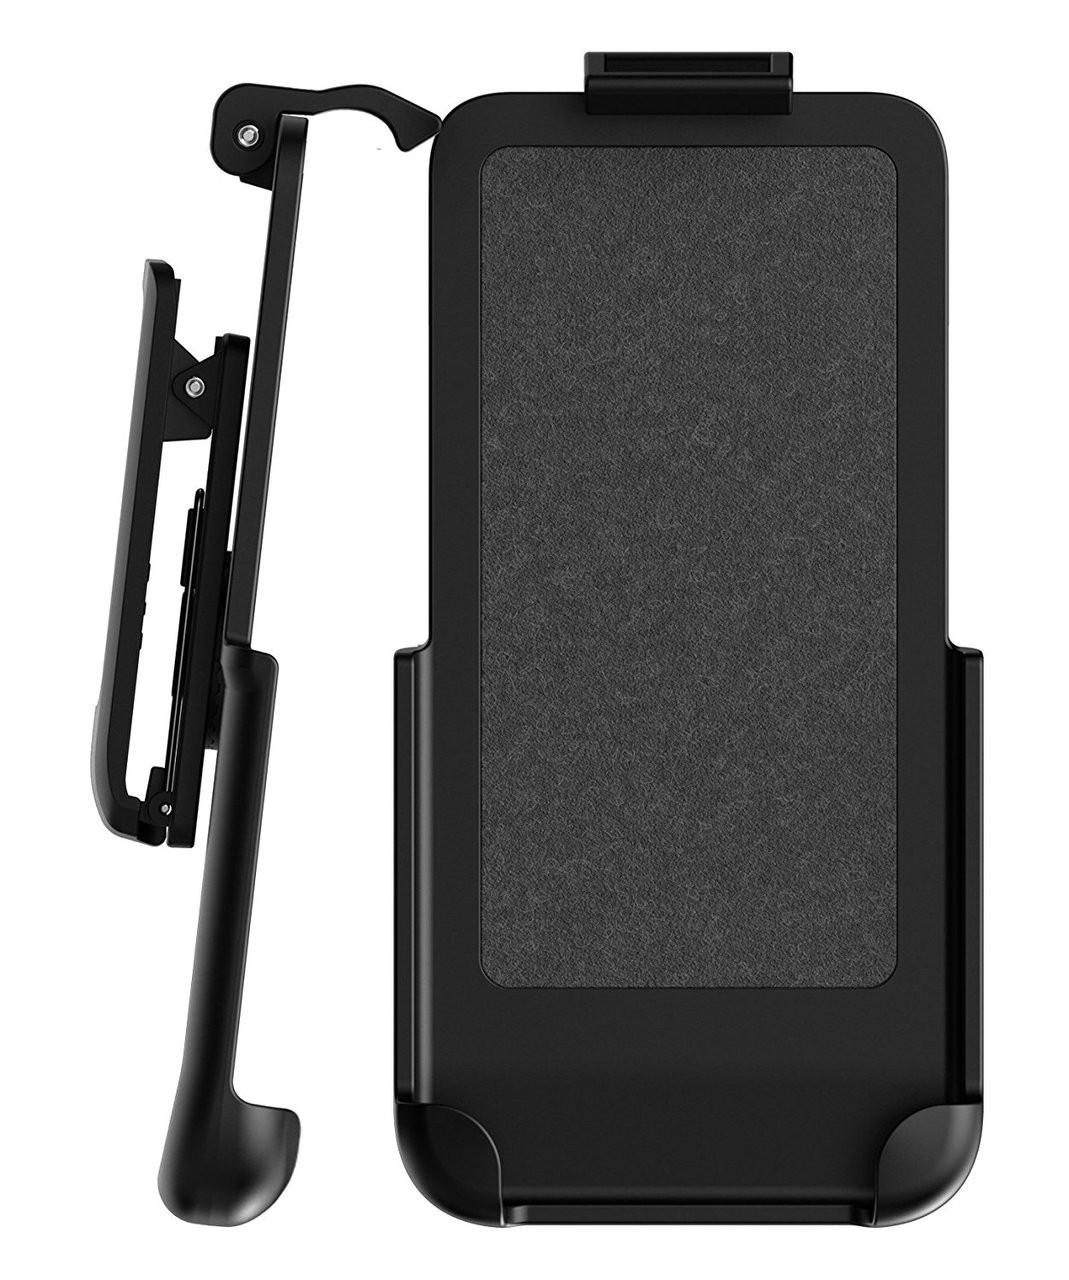 buy online a48ea 1ad36 Encased Belt Clip Holster for LifeProof FRE Google Pixel 2 XL (case not  included)